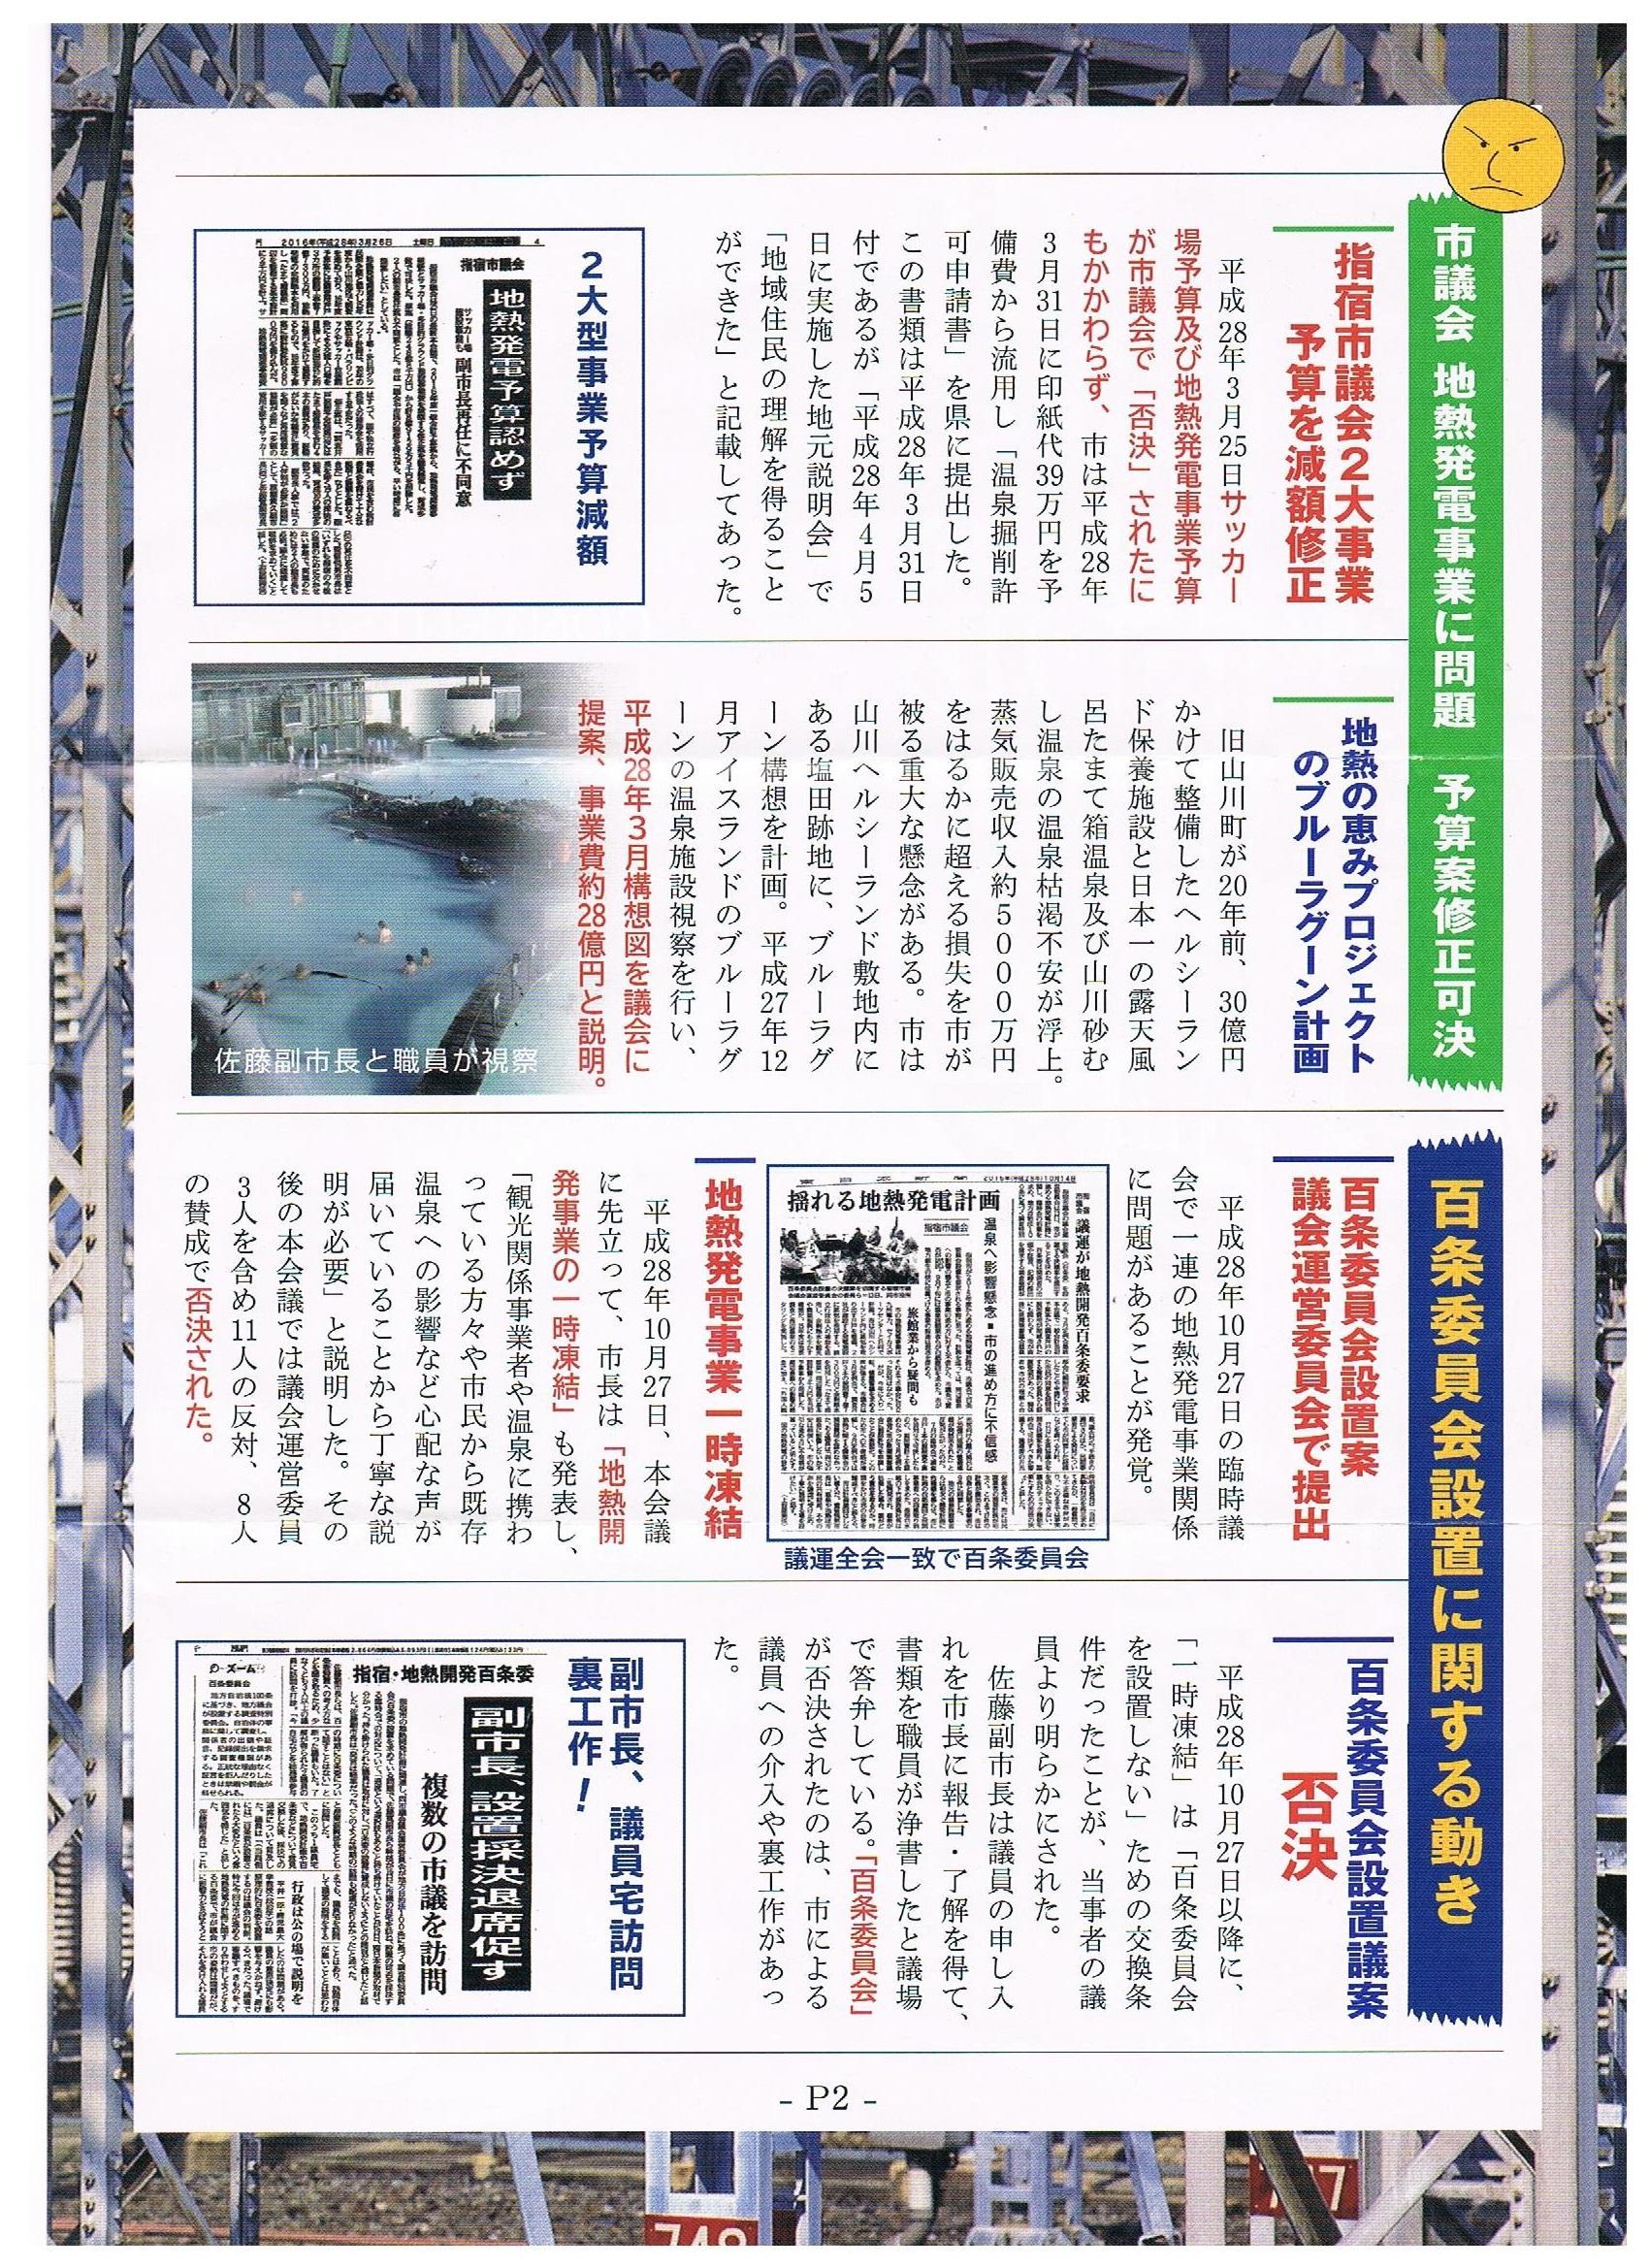 http://hunter-investigate.jp/news/08406c015677b3d074a9ed59eb4e2f0894751327.jpg